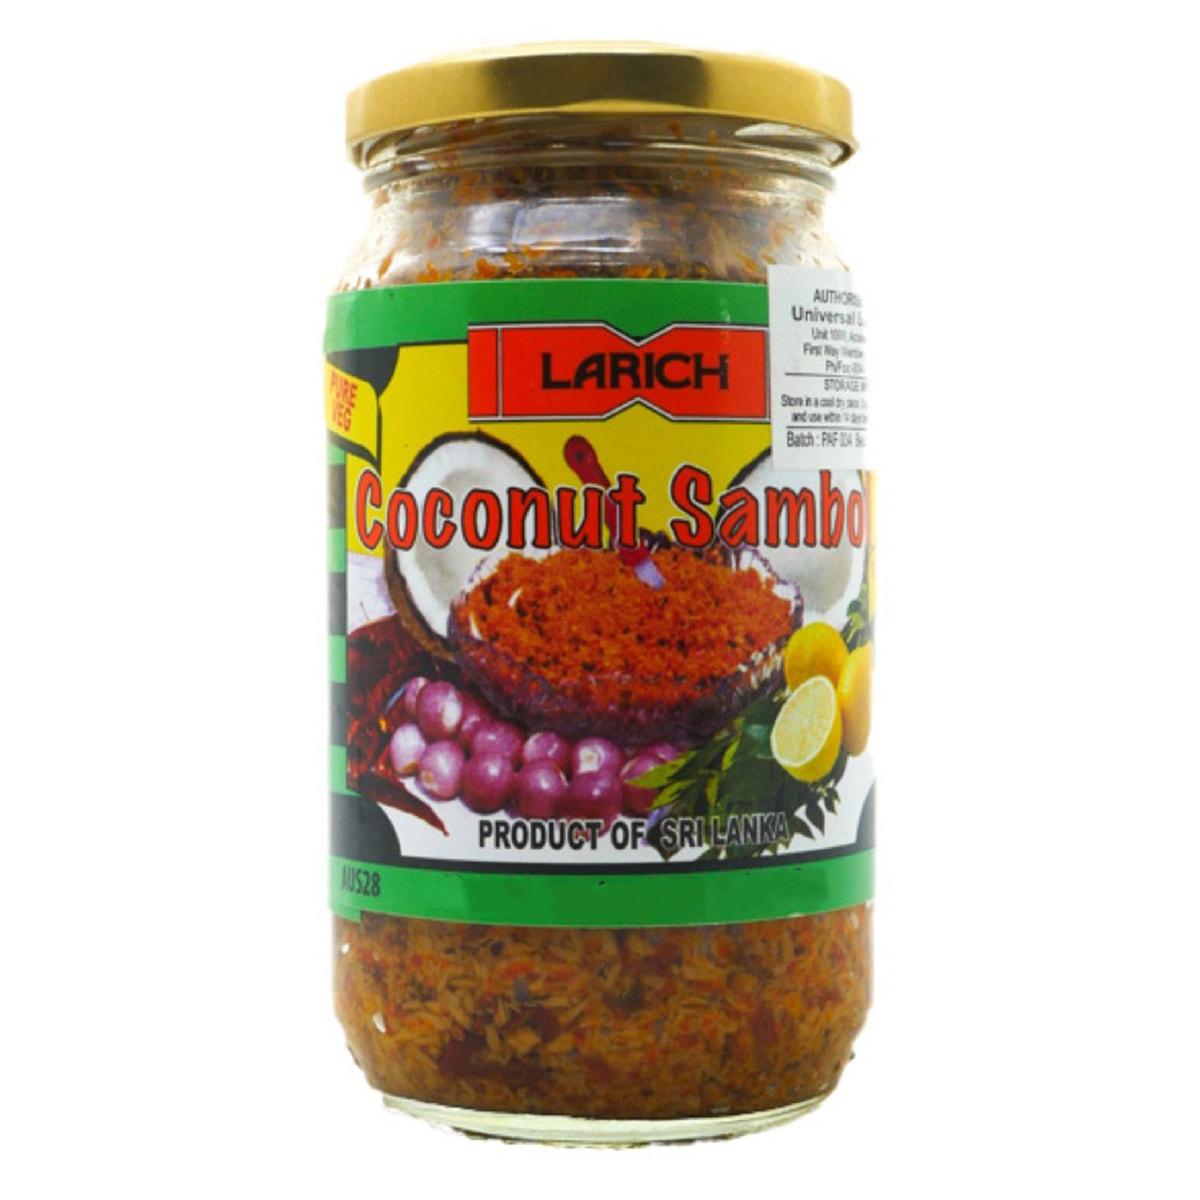 Buy Larich Coconut Sambol - 300 gm